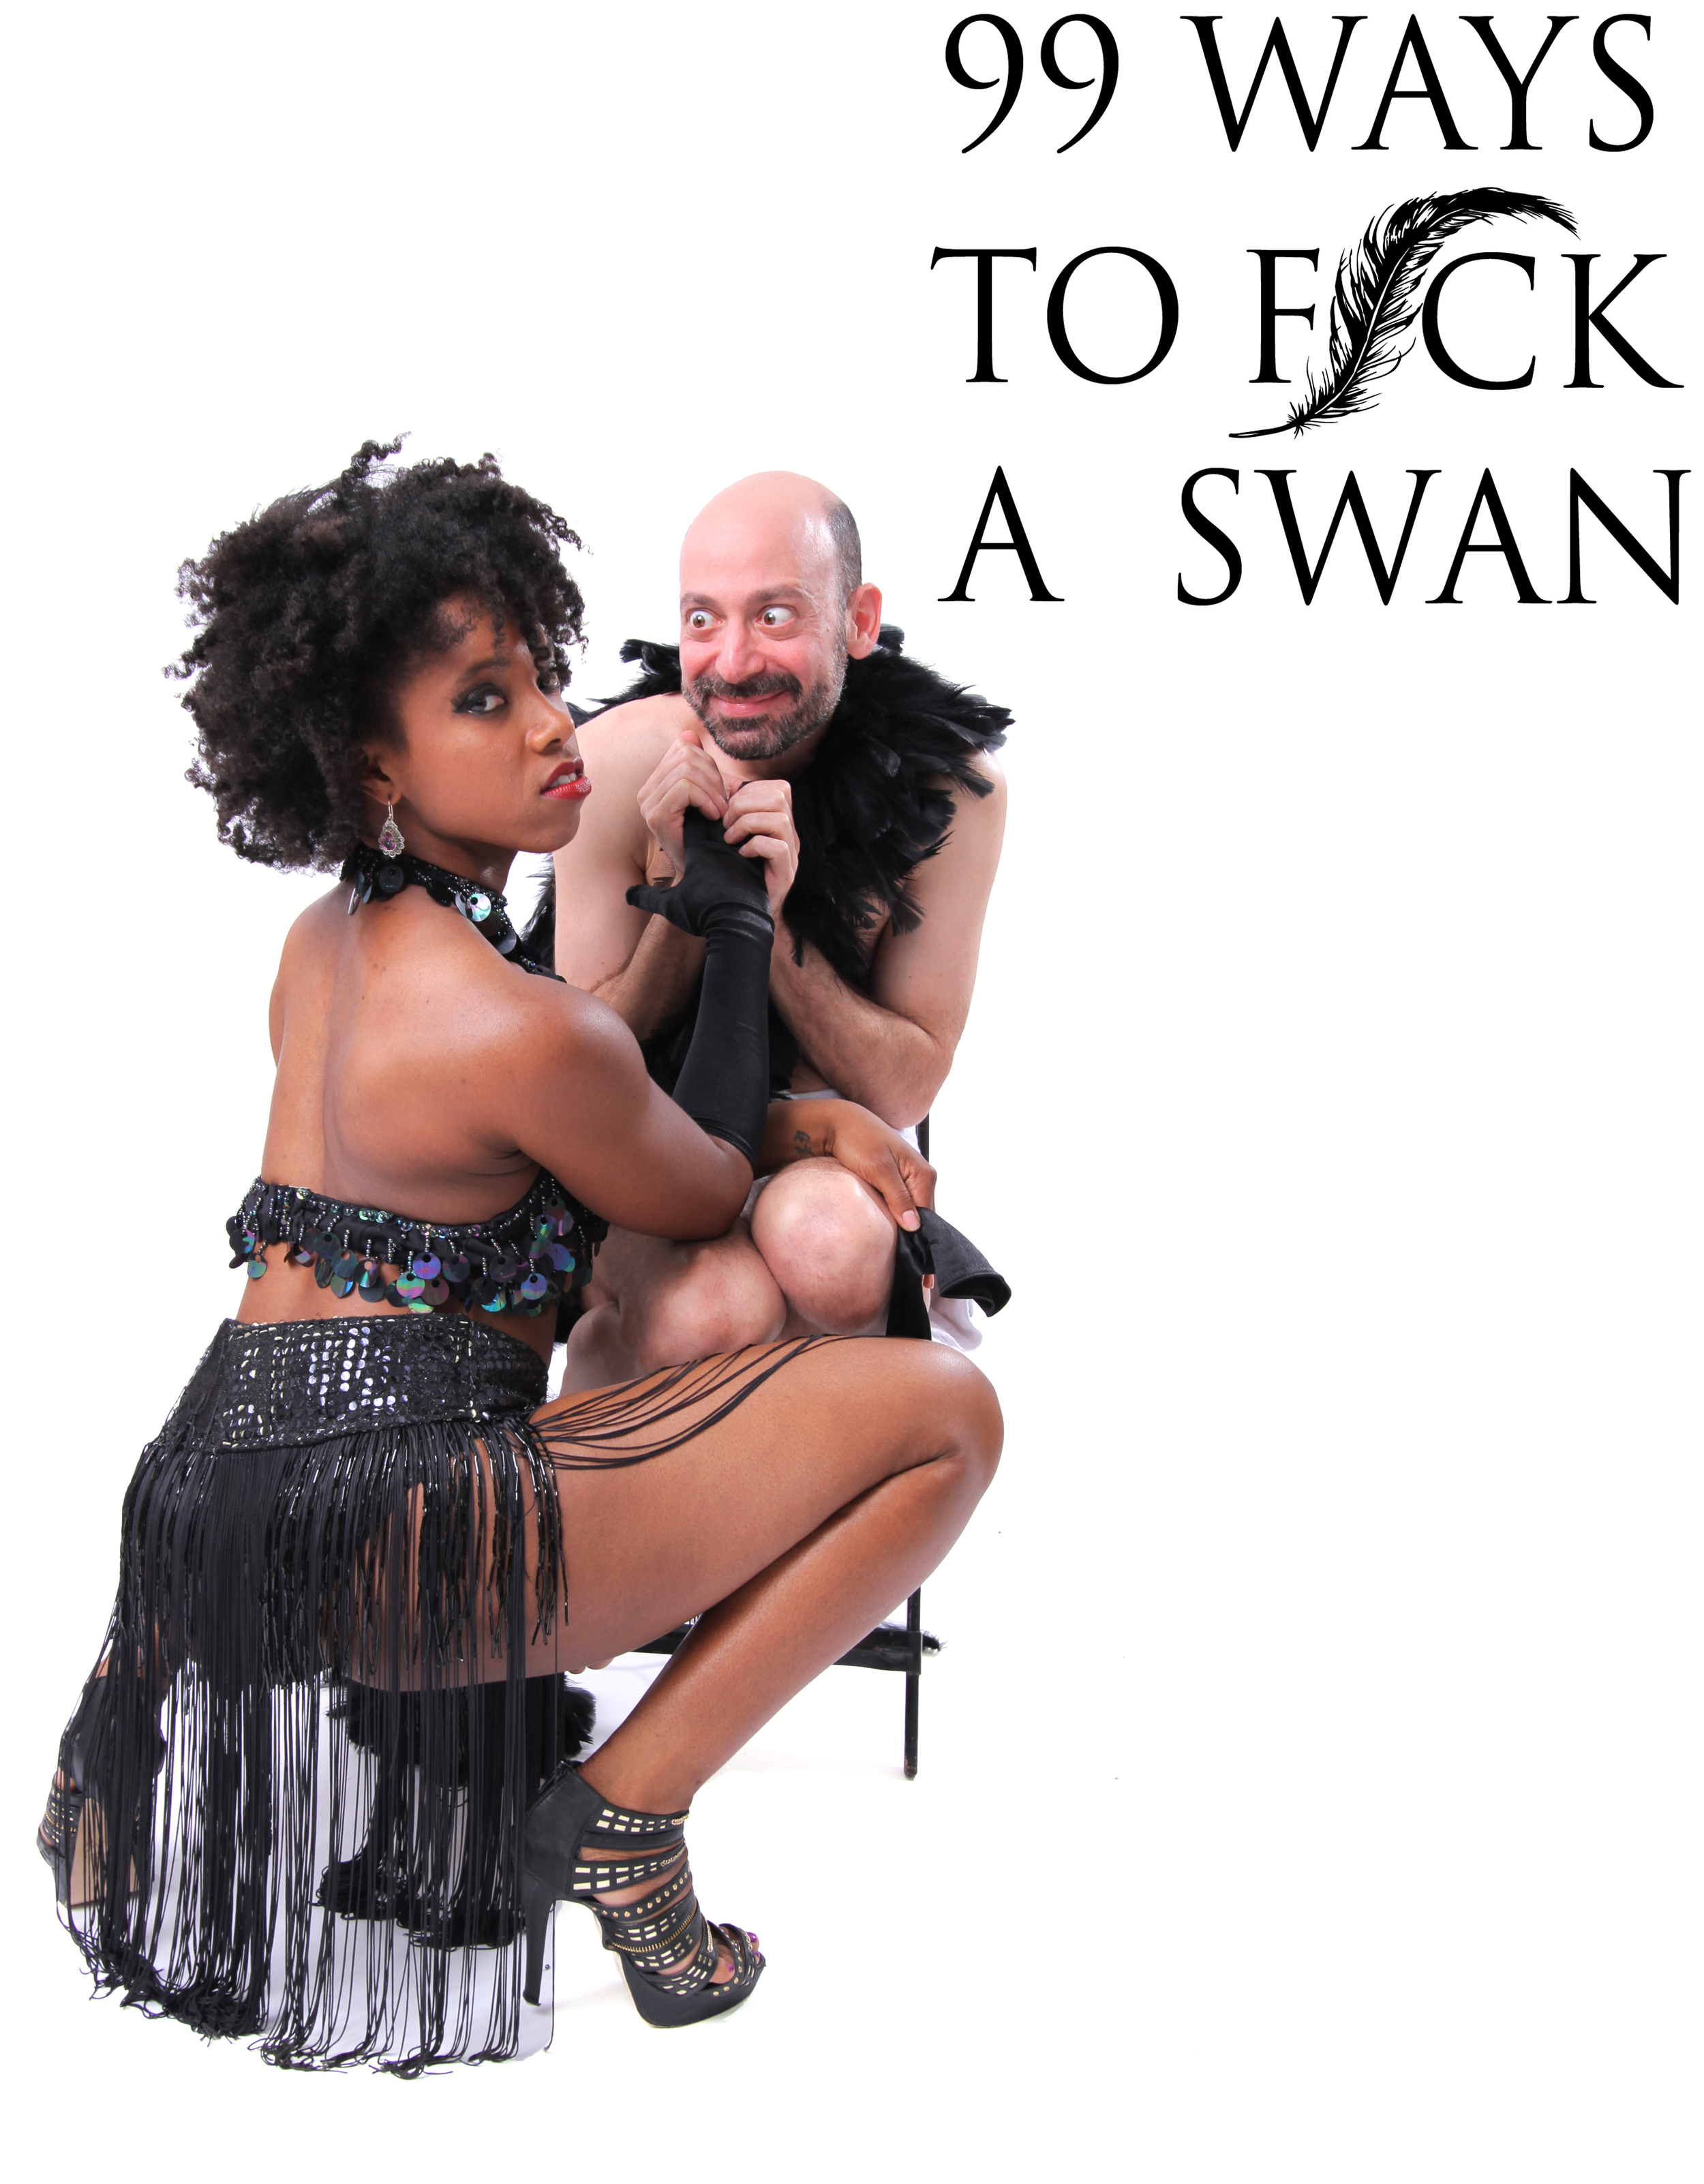 99 Ways to Fuck a Swan promo1.jpg